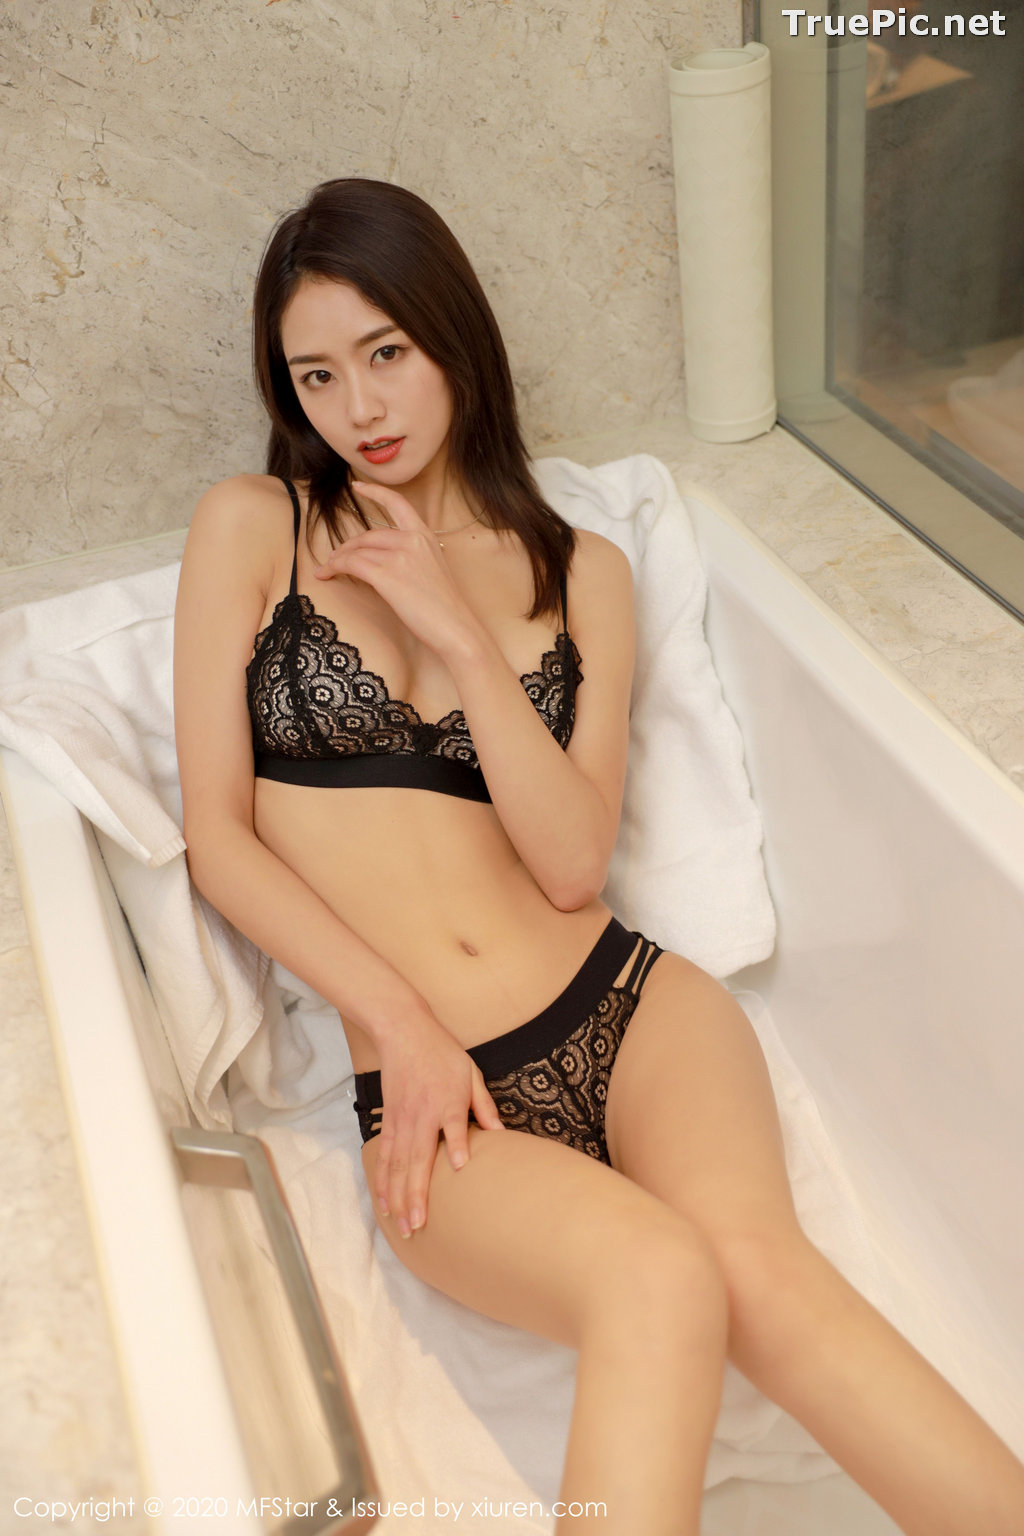 Image MFStar Vol.307 - Chinese Model - Fang Zi Xuan (方子萱) - TruePic.net - Picture-2